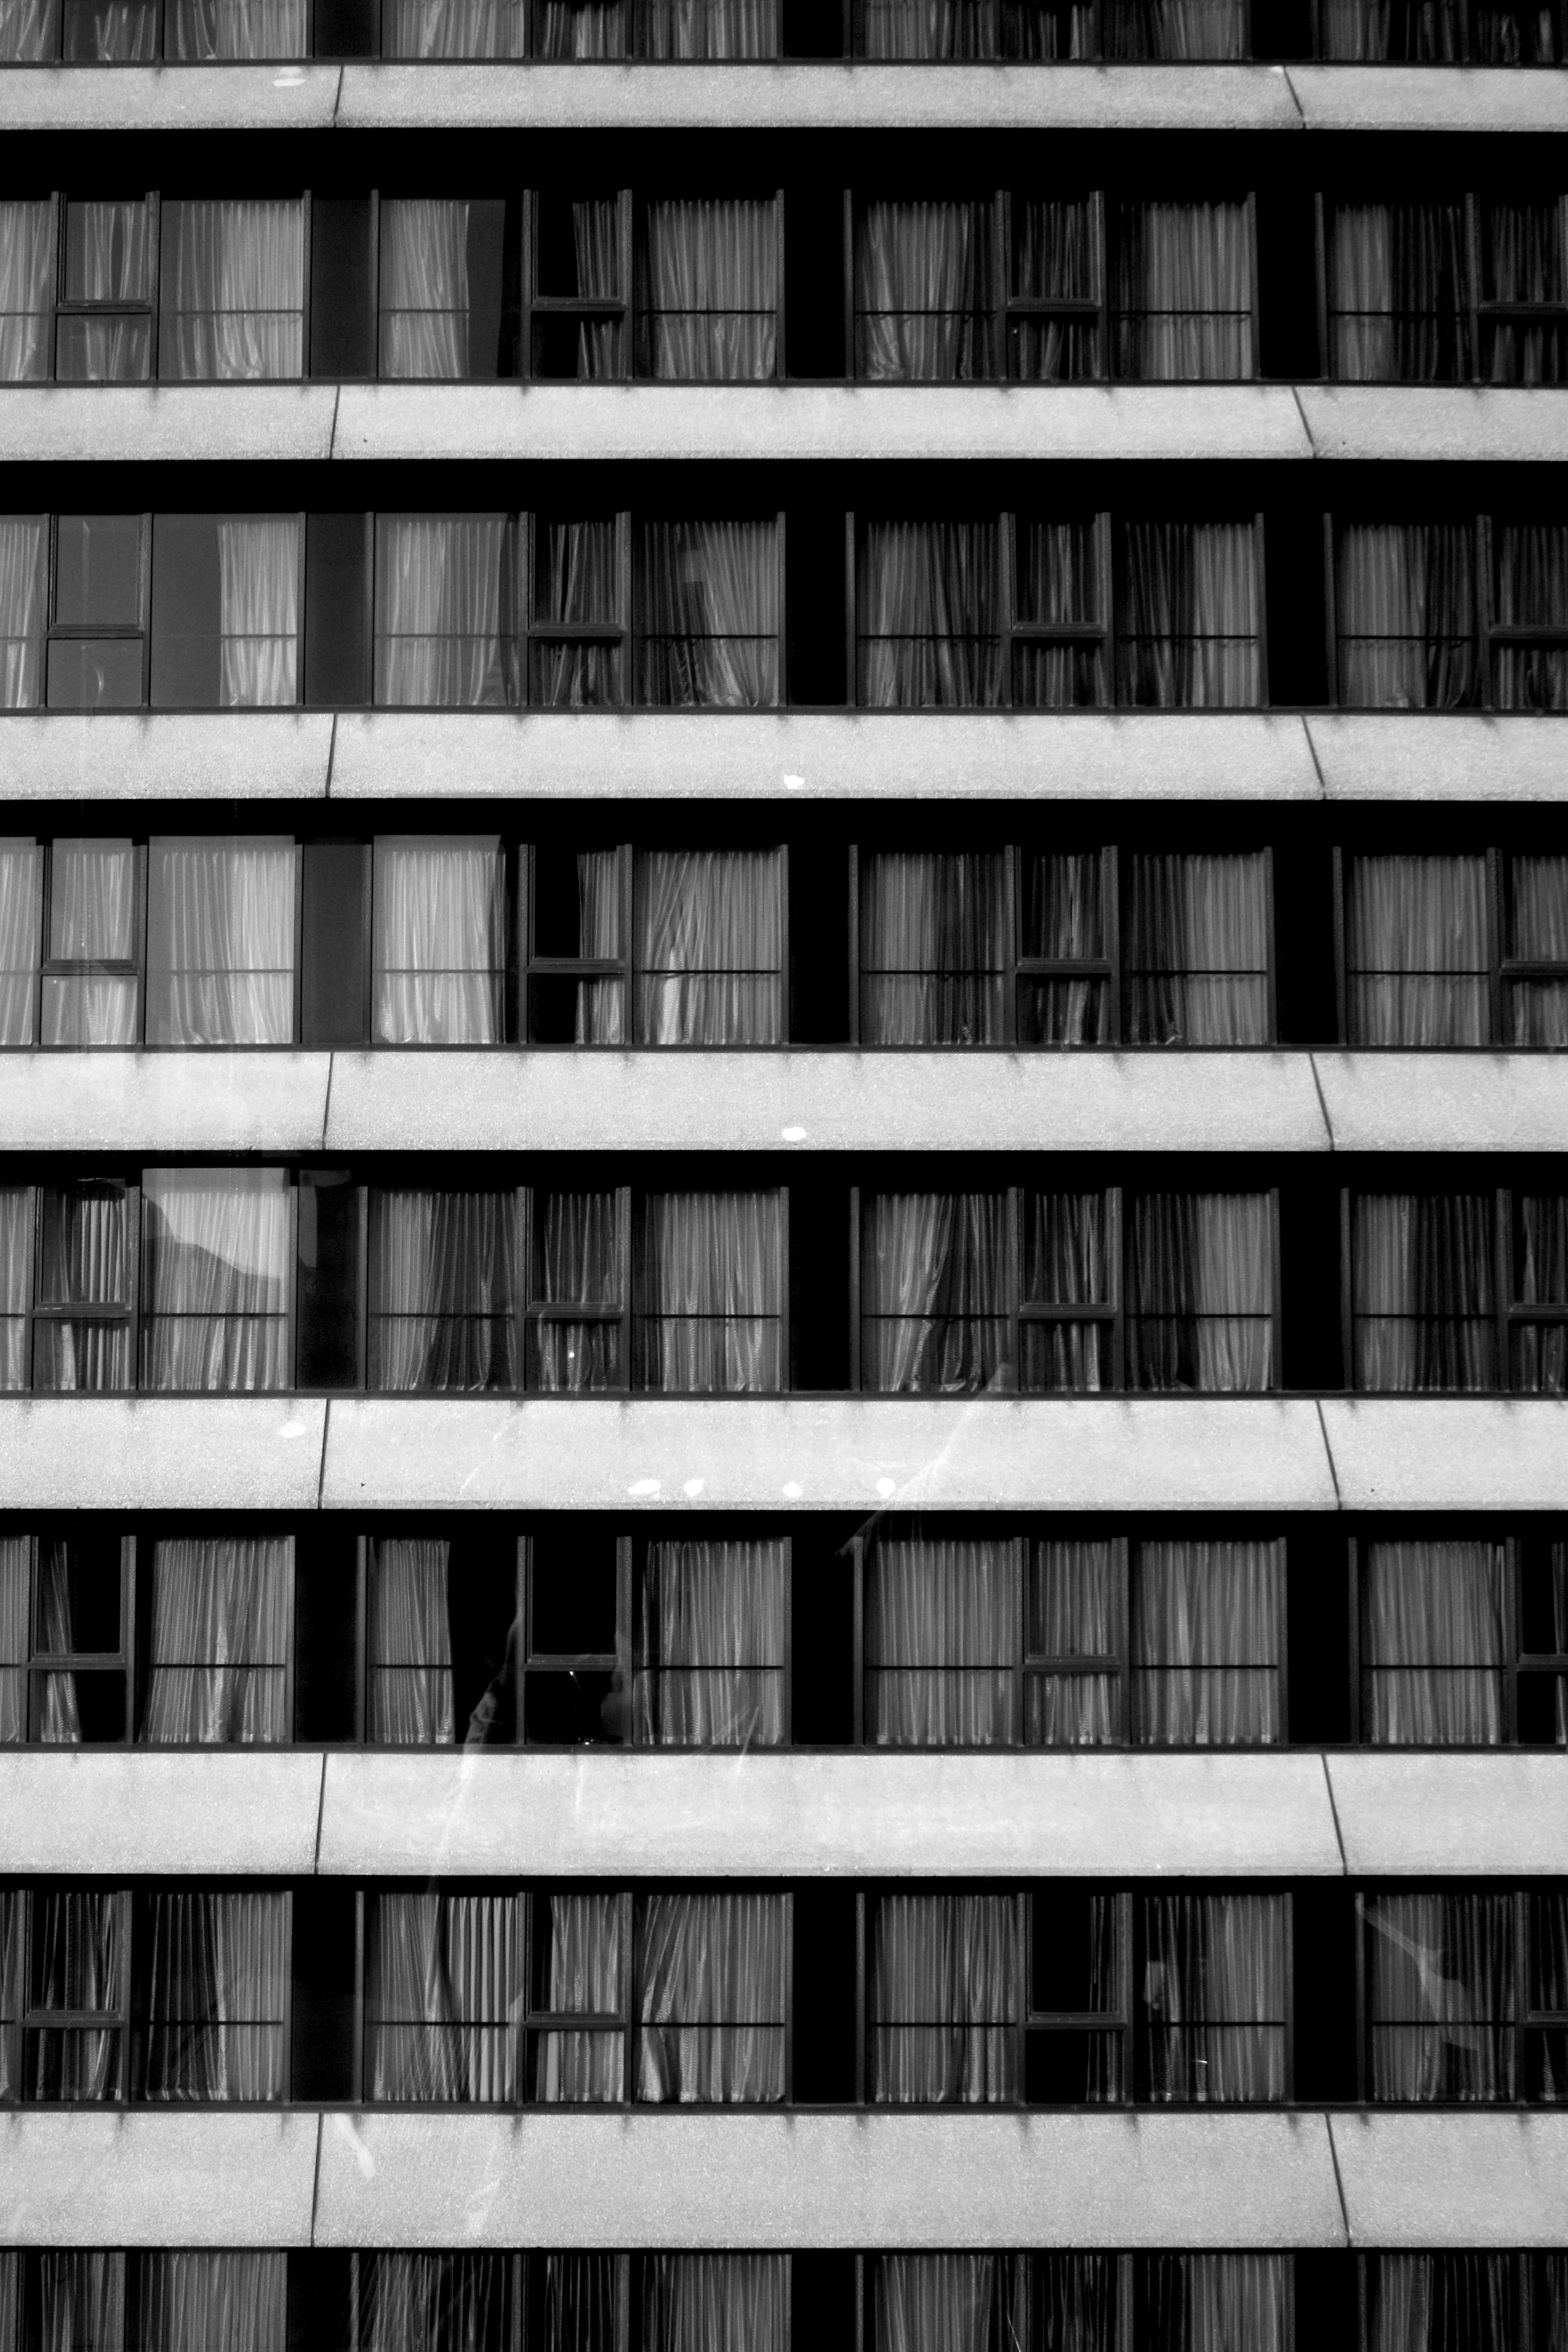 White Curtains on Window Free Stock